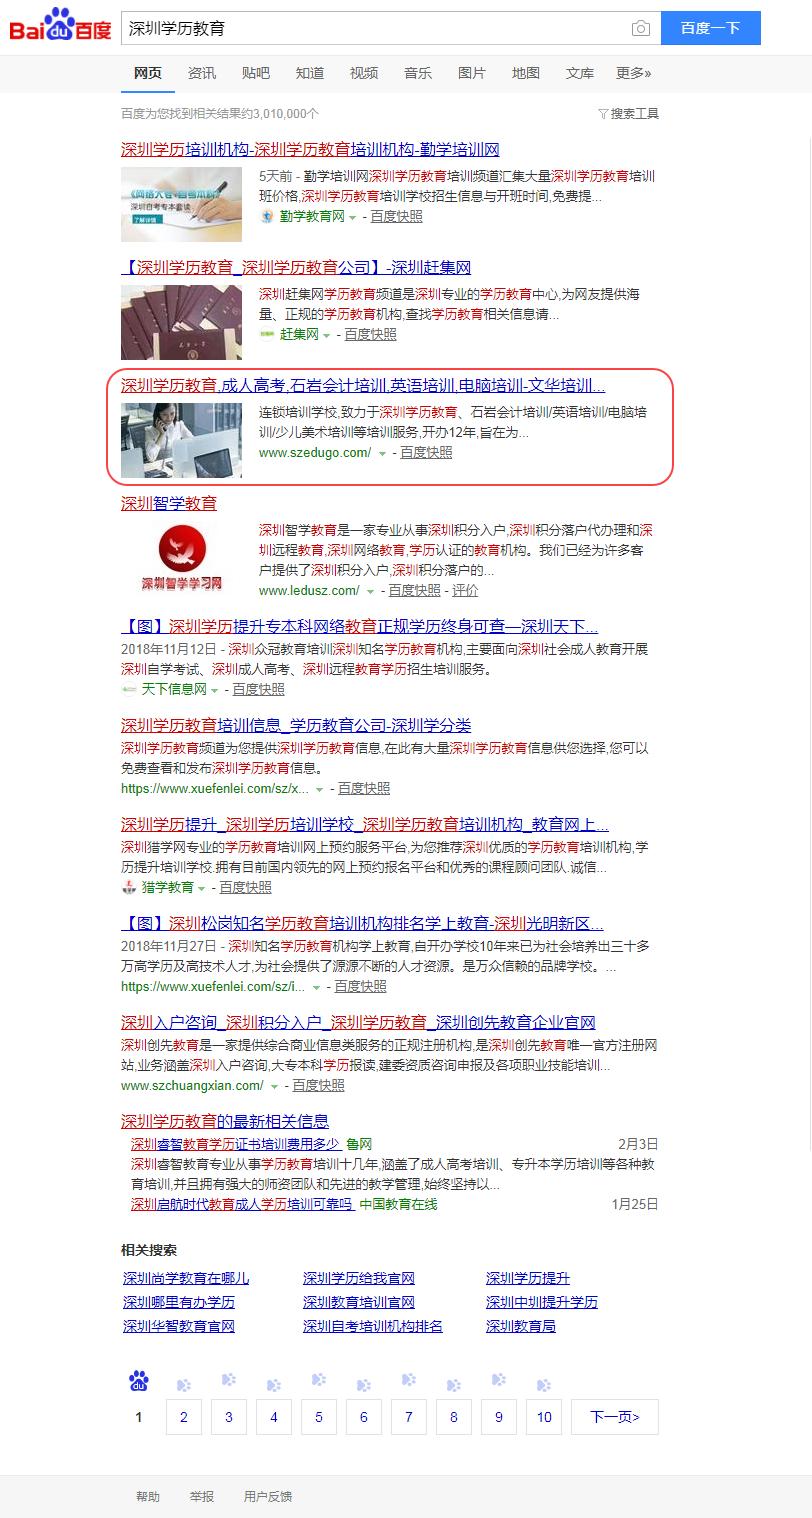 SEO排名优化案例-深圳学历教育